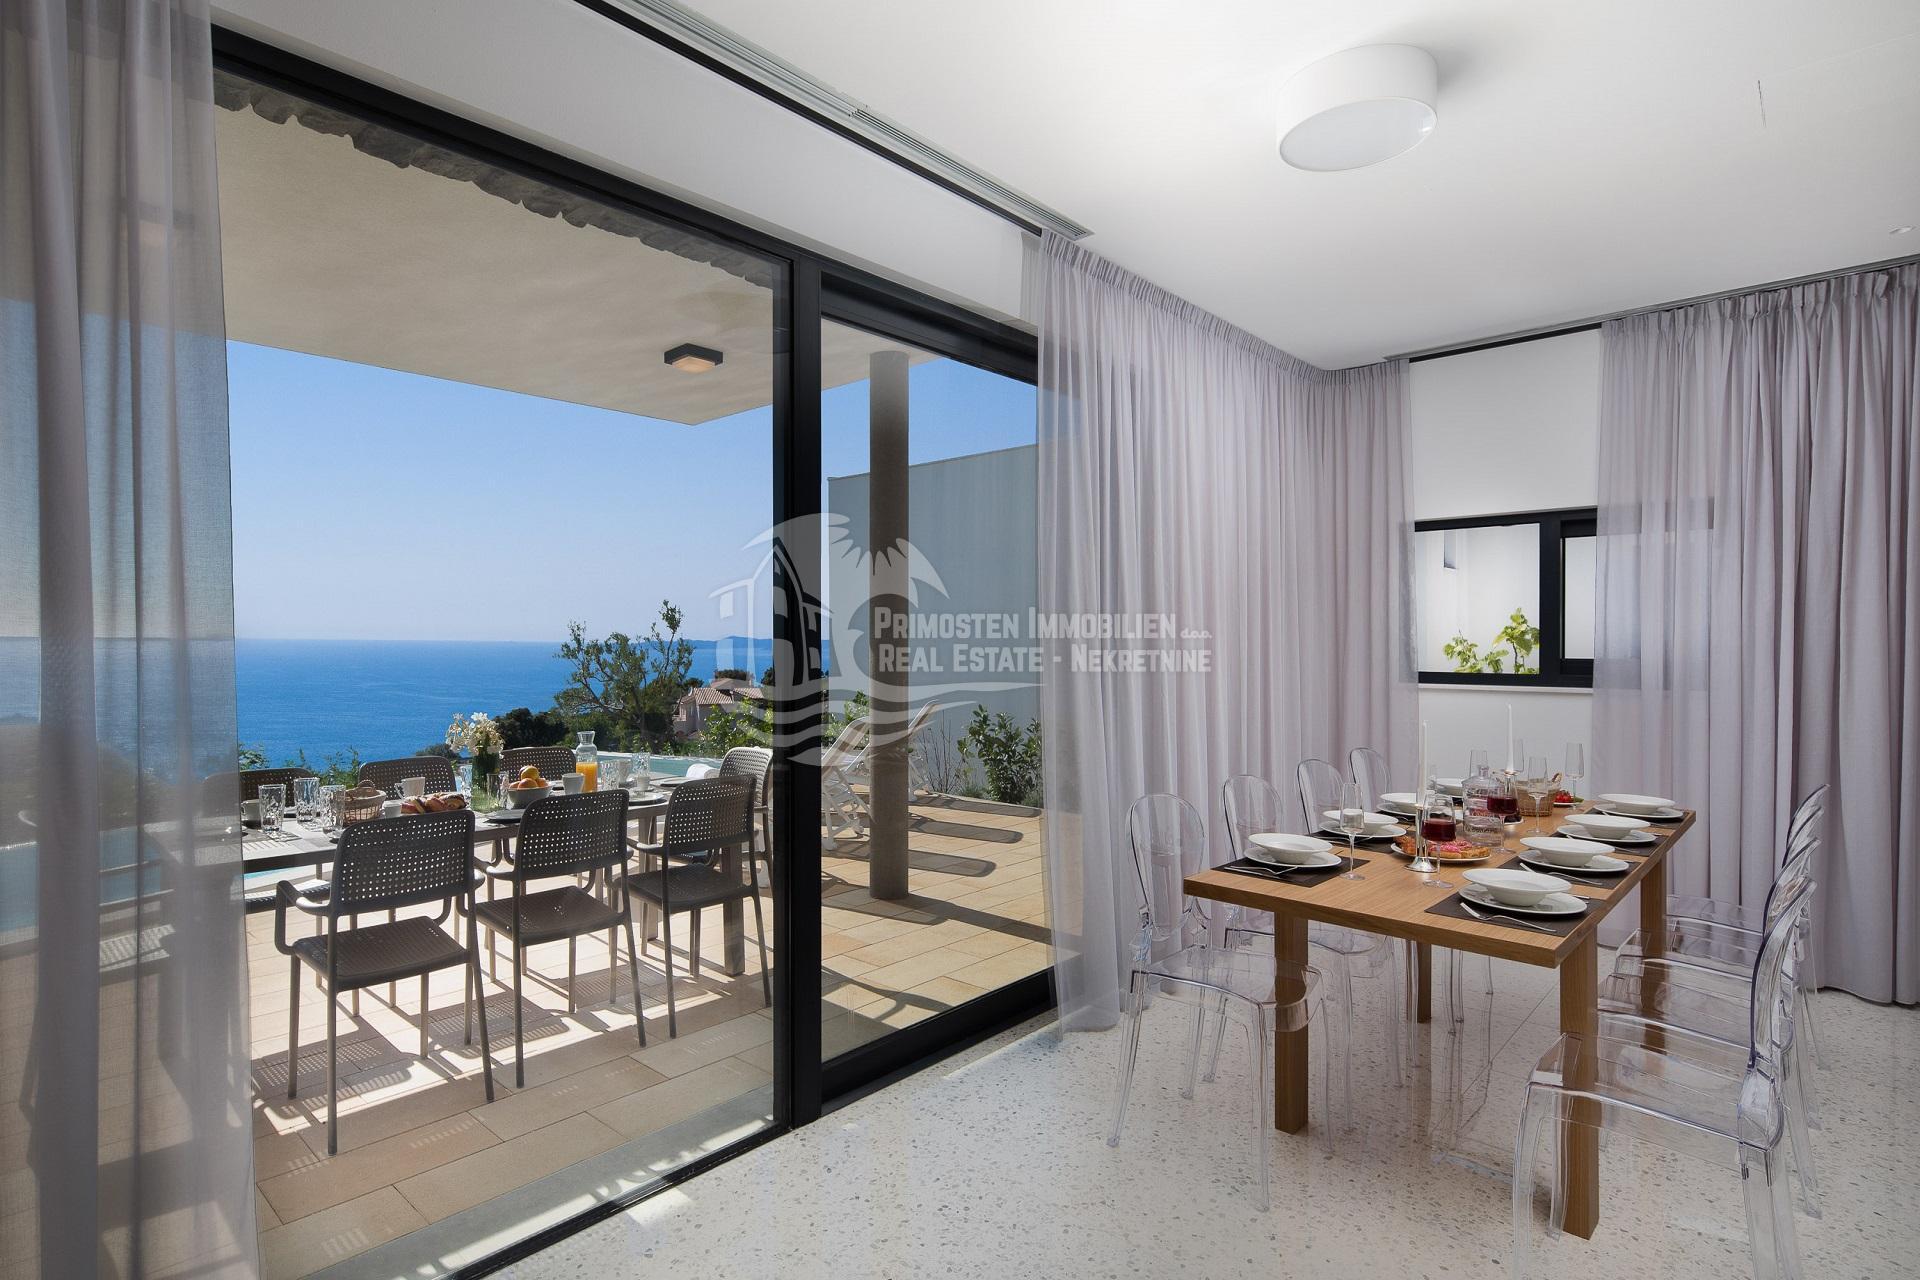 Luxuriöse neu erbaute Villa mit unübertroffenem Meerblick